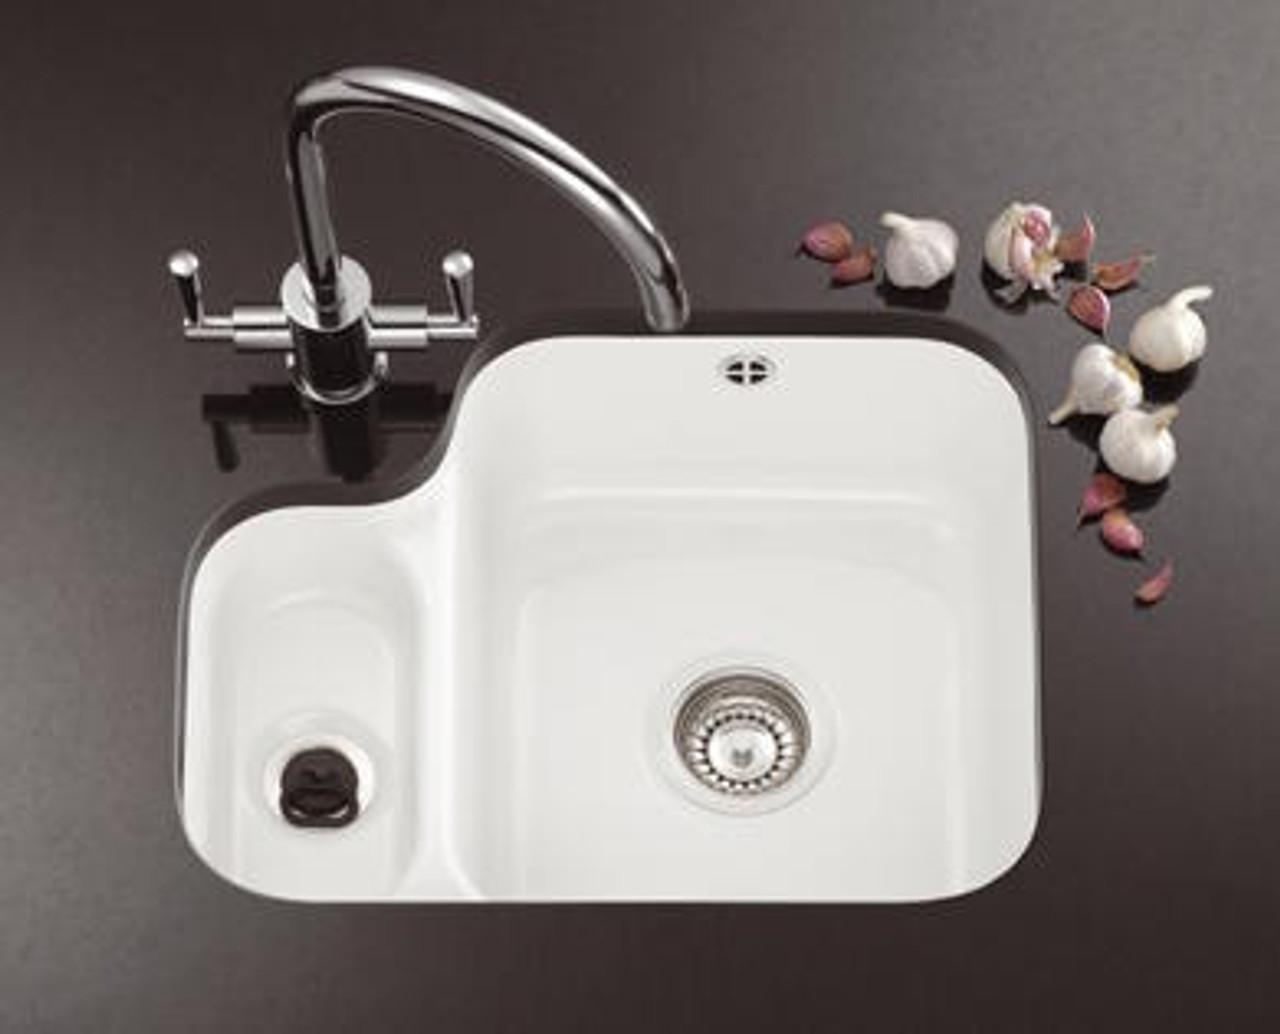 Awesome Franke Vbk160 Ceramic White Kitchen Sink Home Interior And Landscaping Ologienasavecom